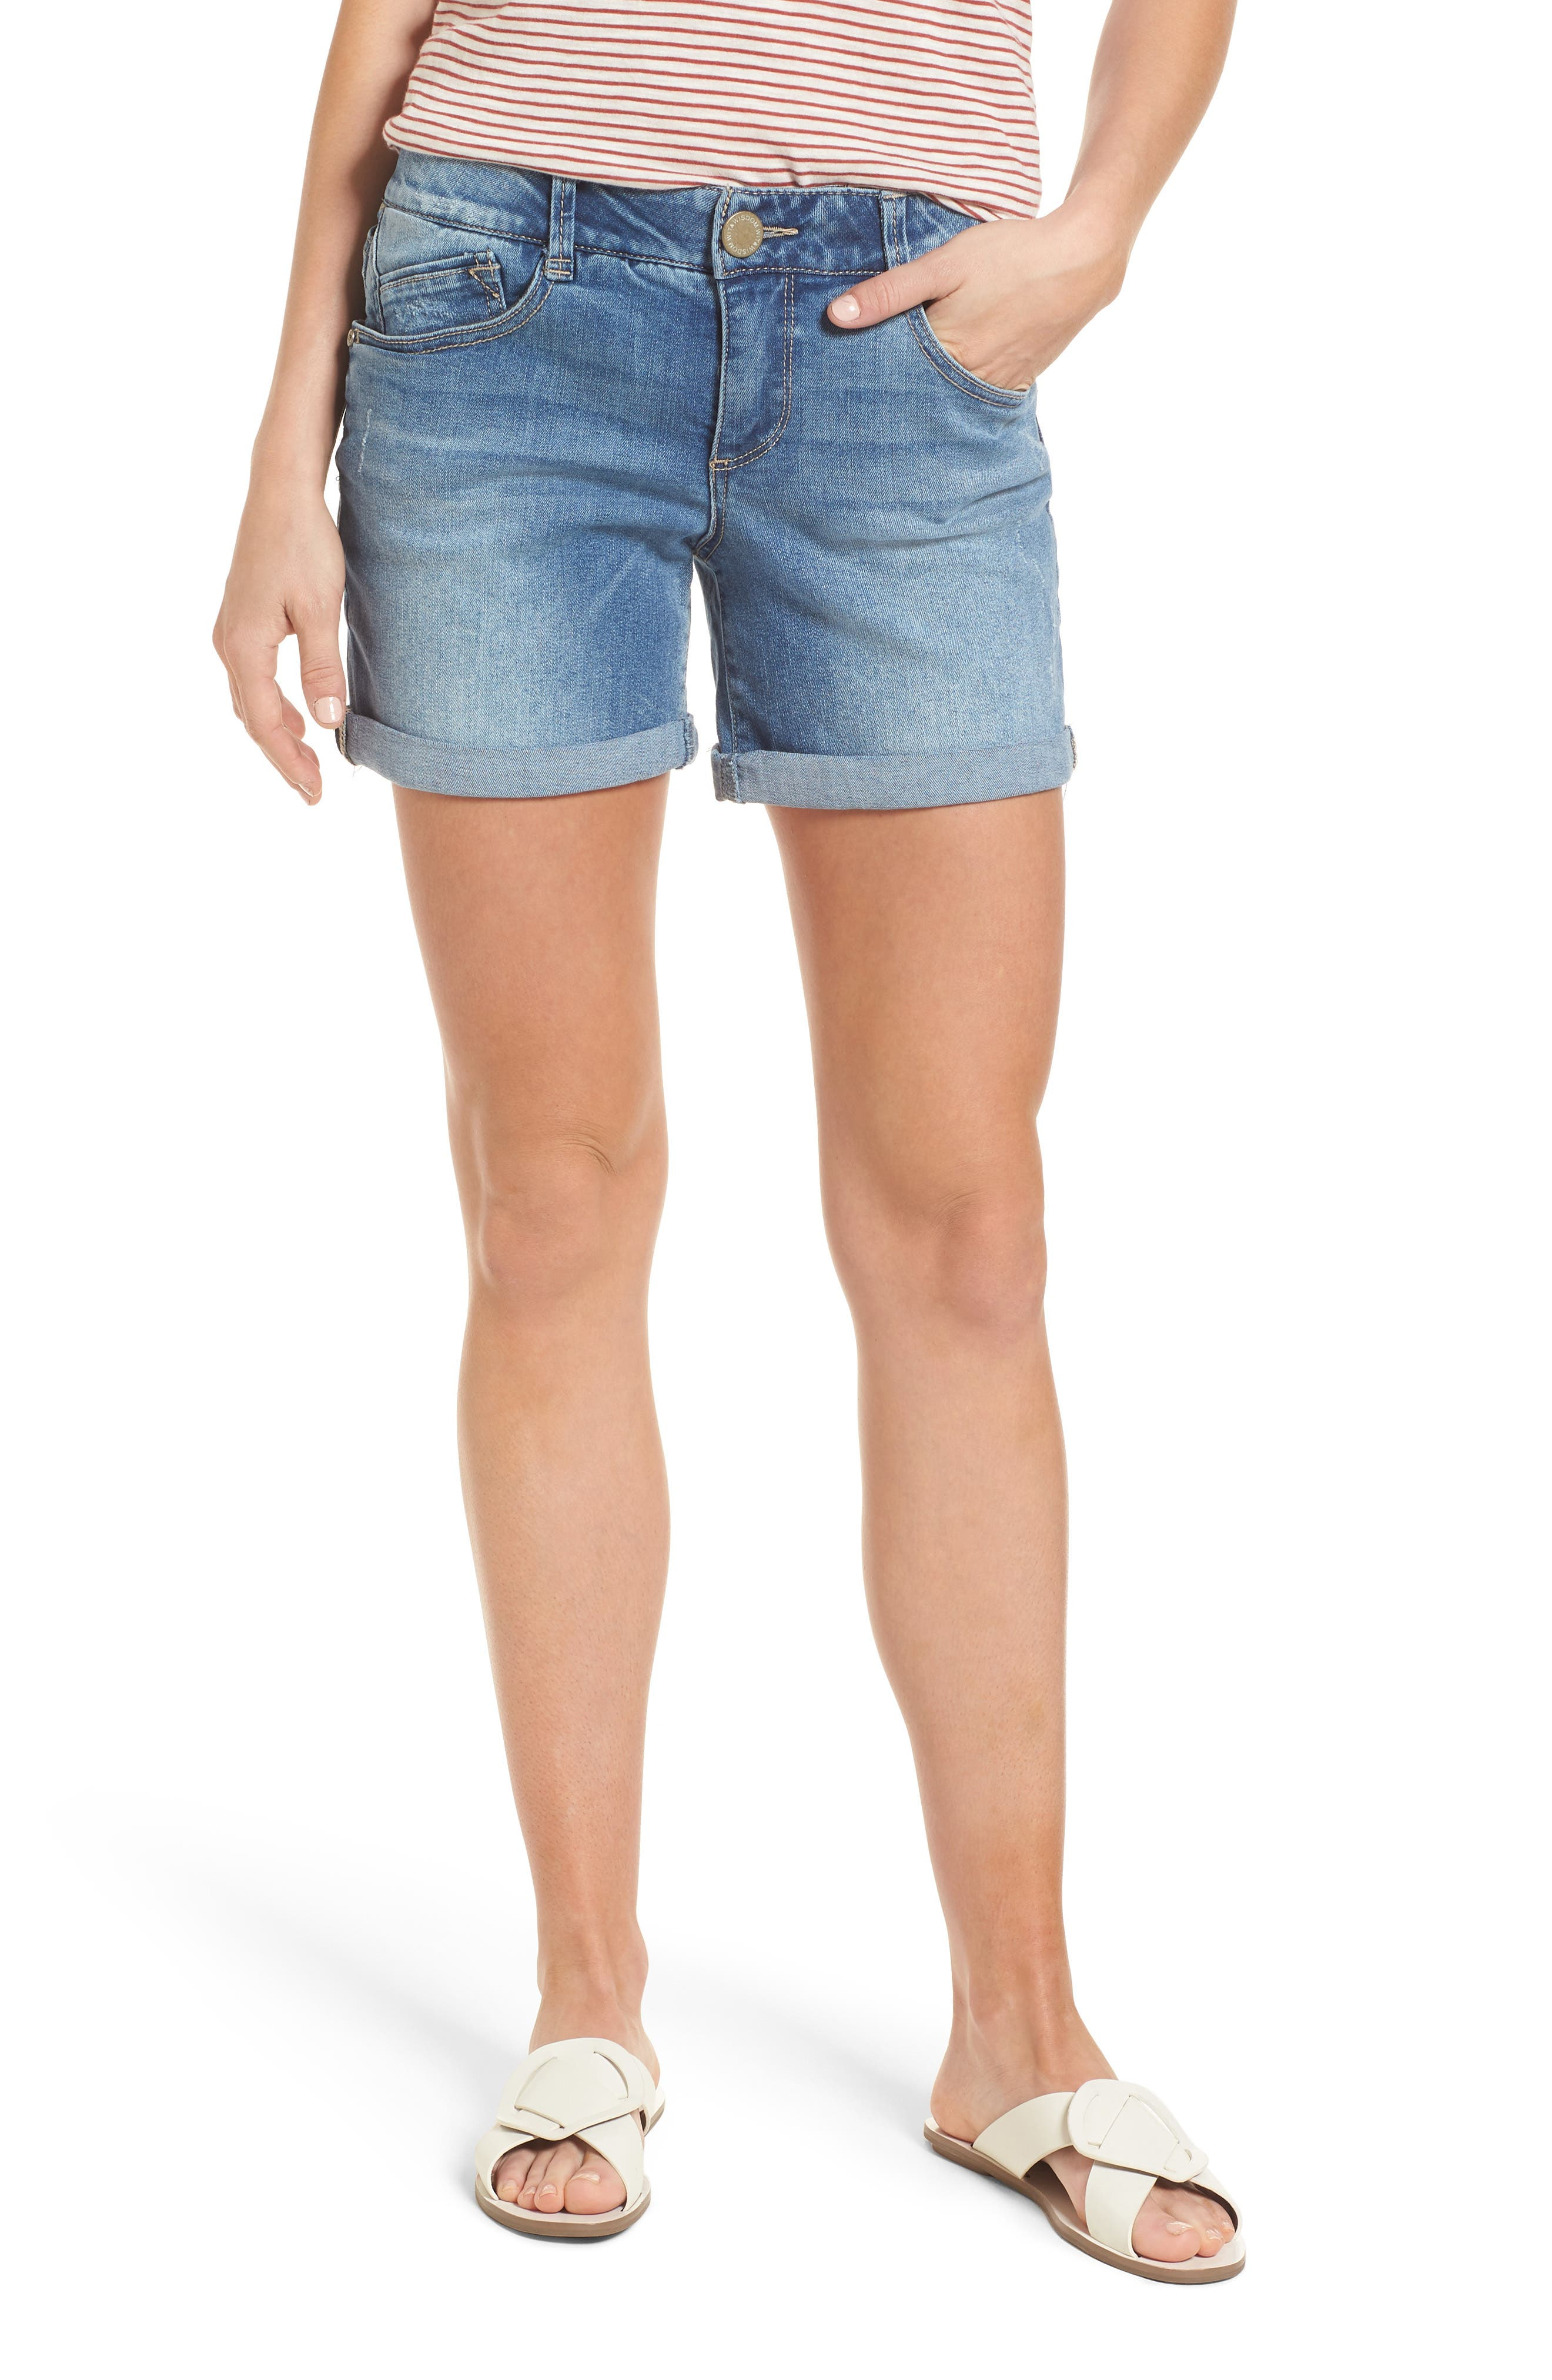 Ab-solution Denim Shorts,                         Main,                         color, Light Blue